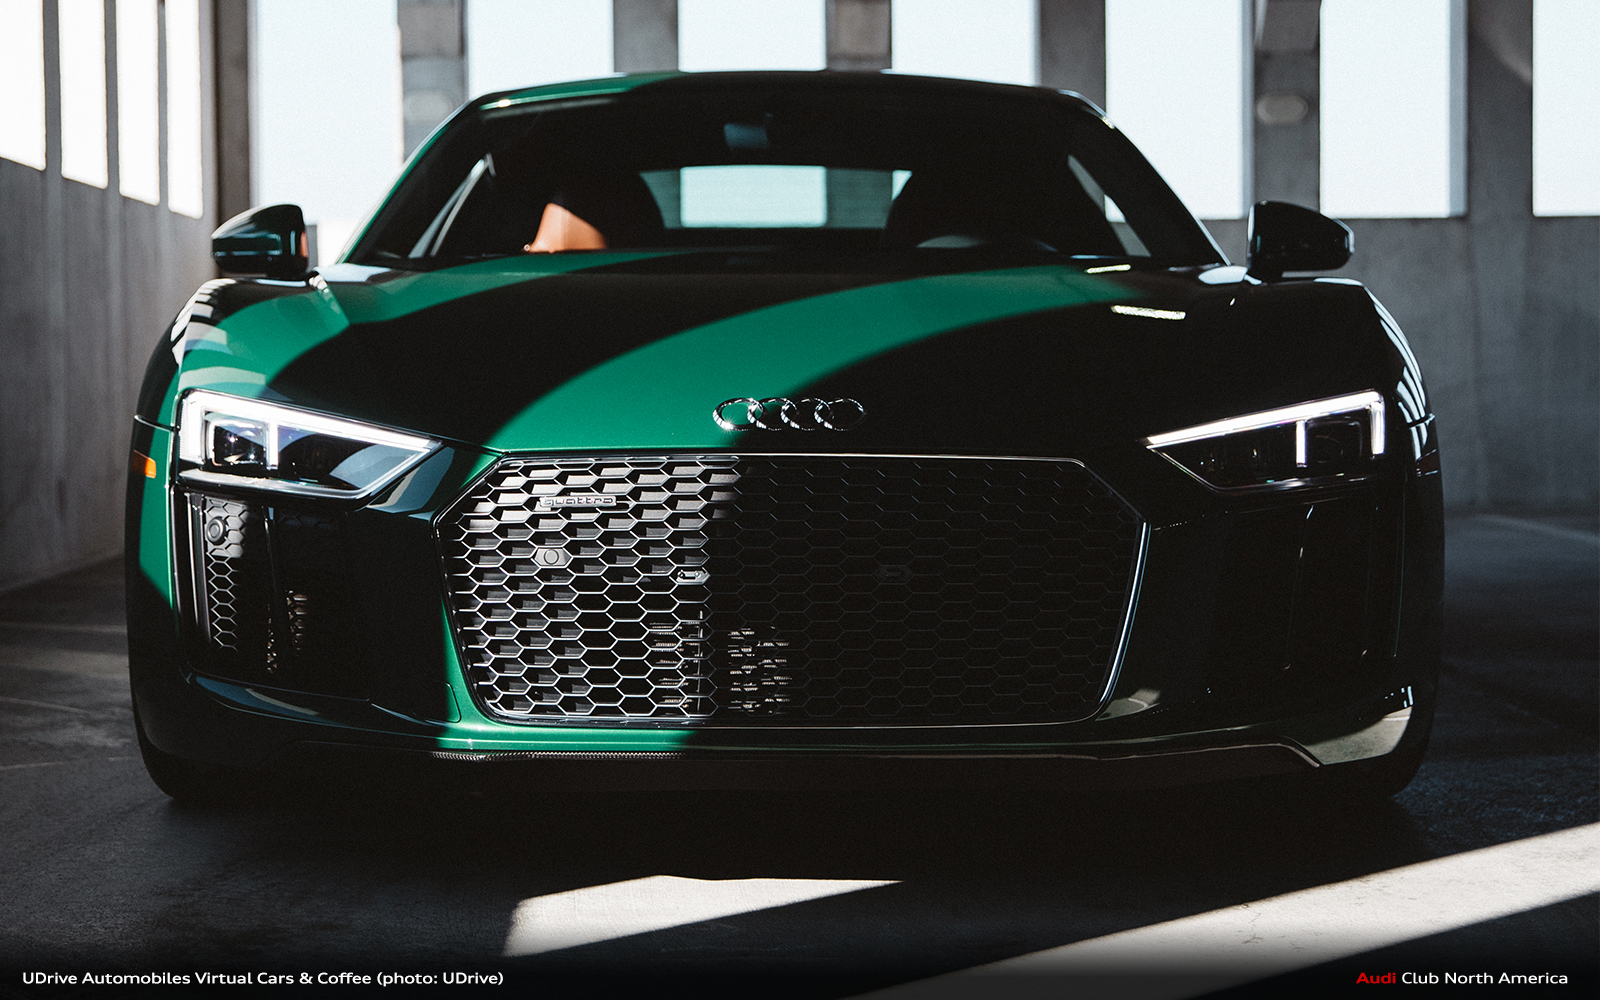 UDrive Automobiles Virtual Cars & Coffee